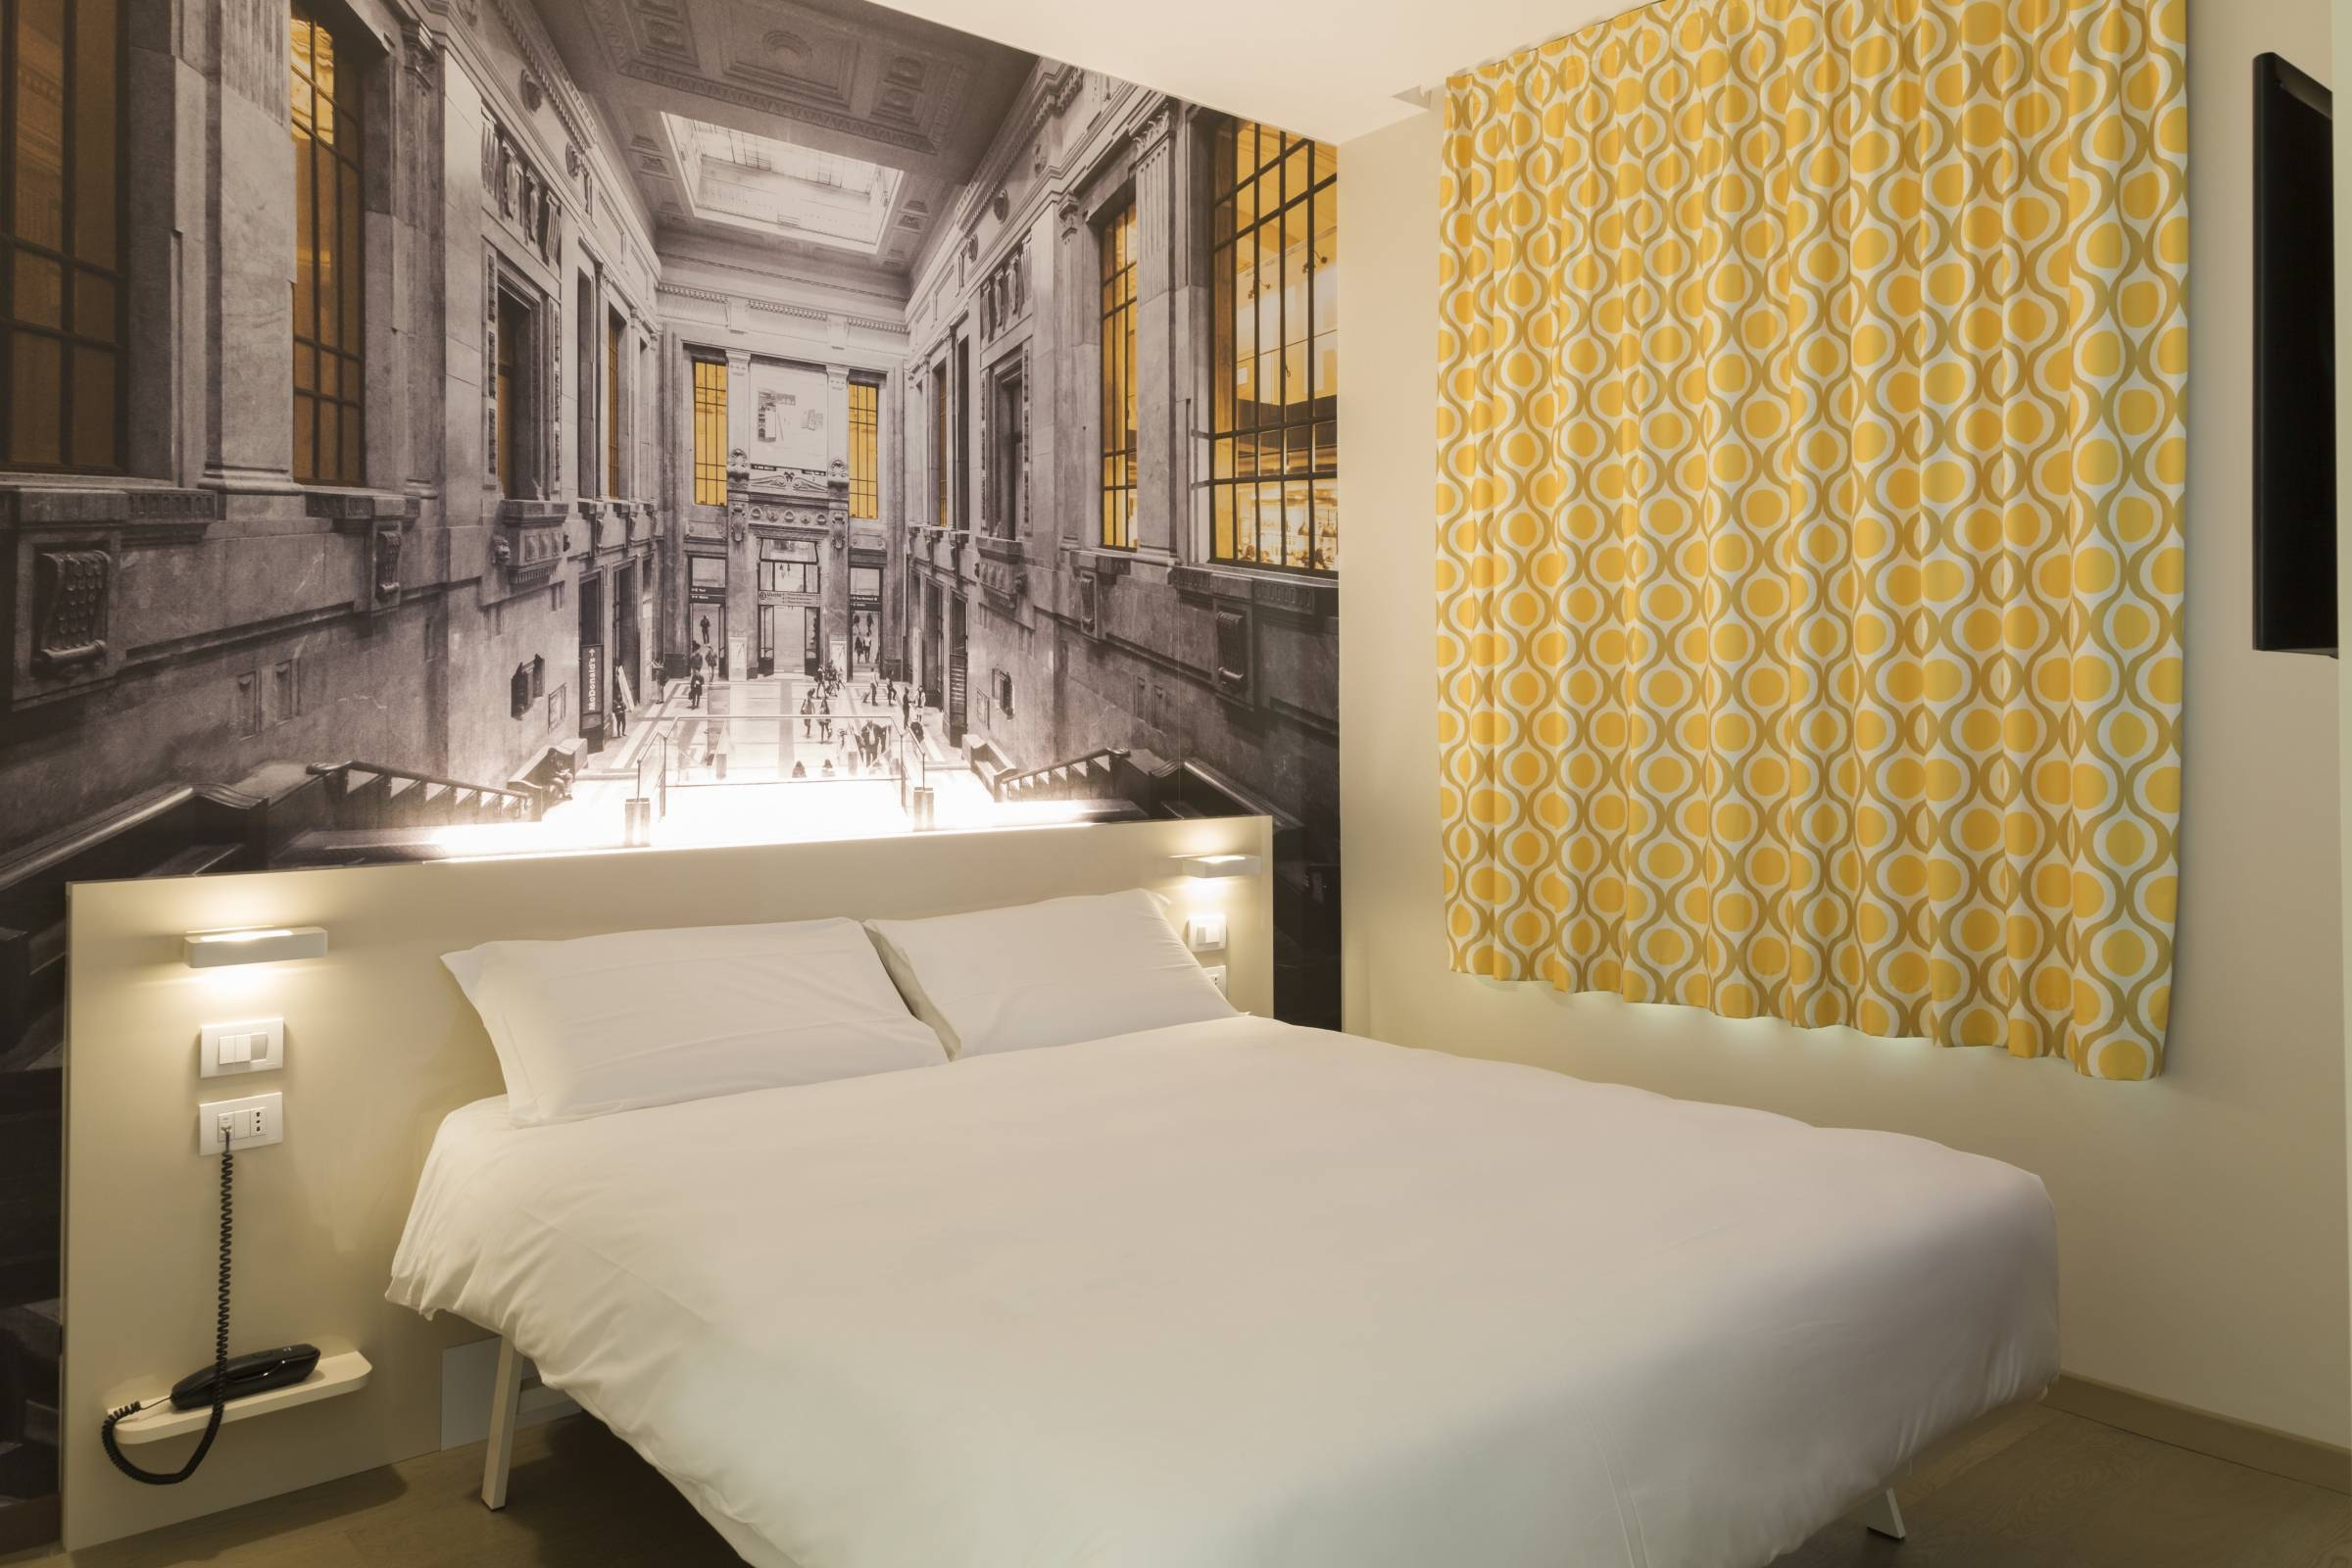 B&b Corso Sempione Milano b&b hotel milano central station - 3 hrs star hotel in milan